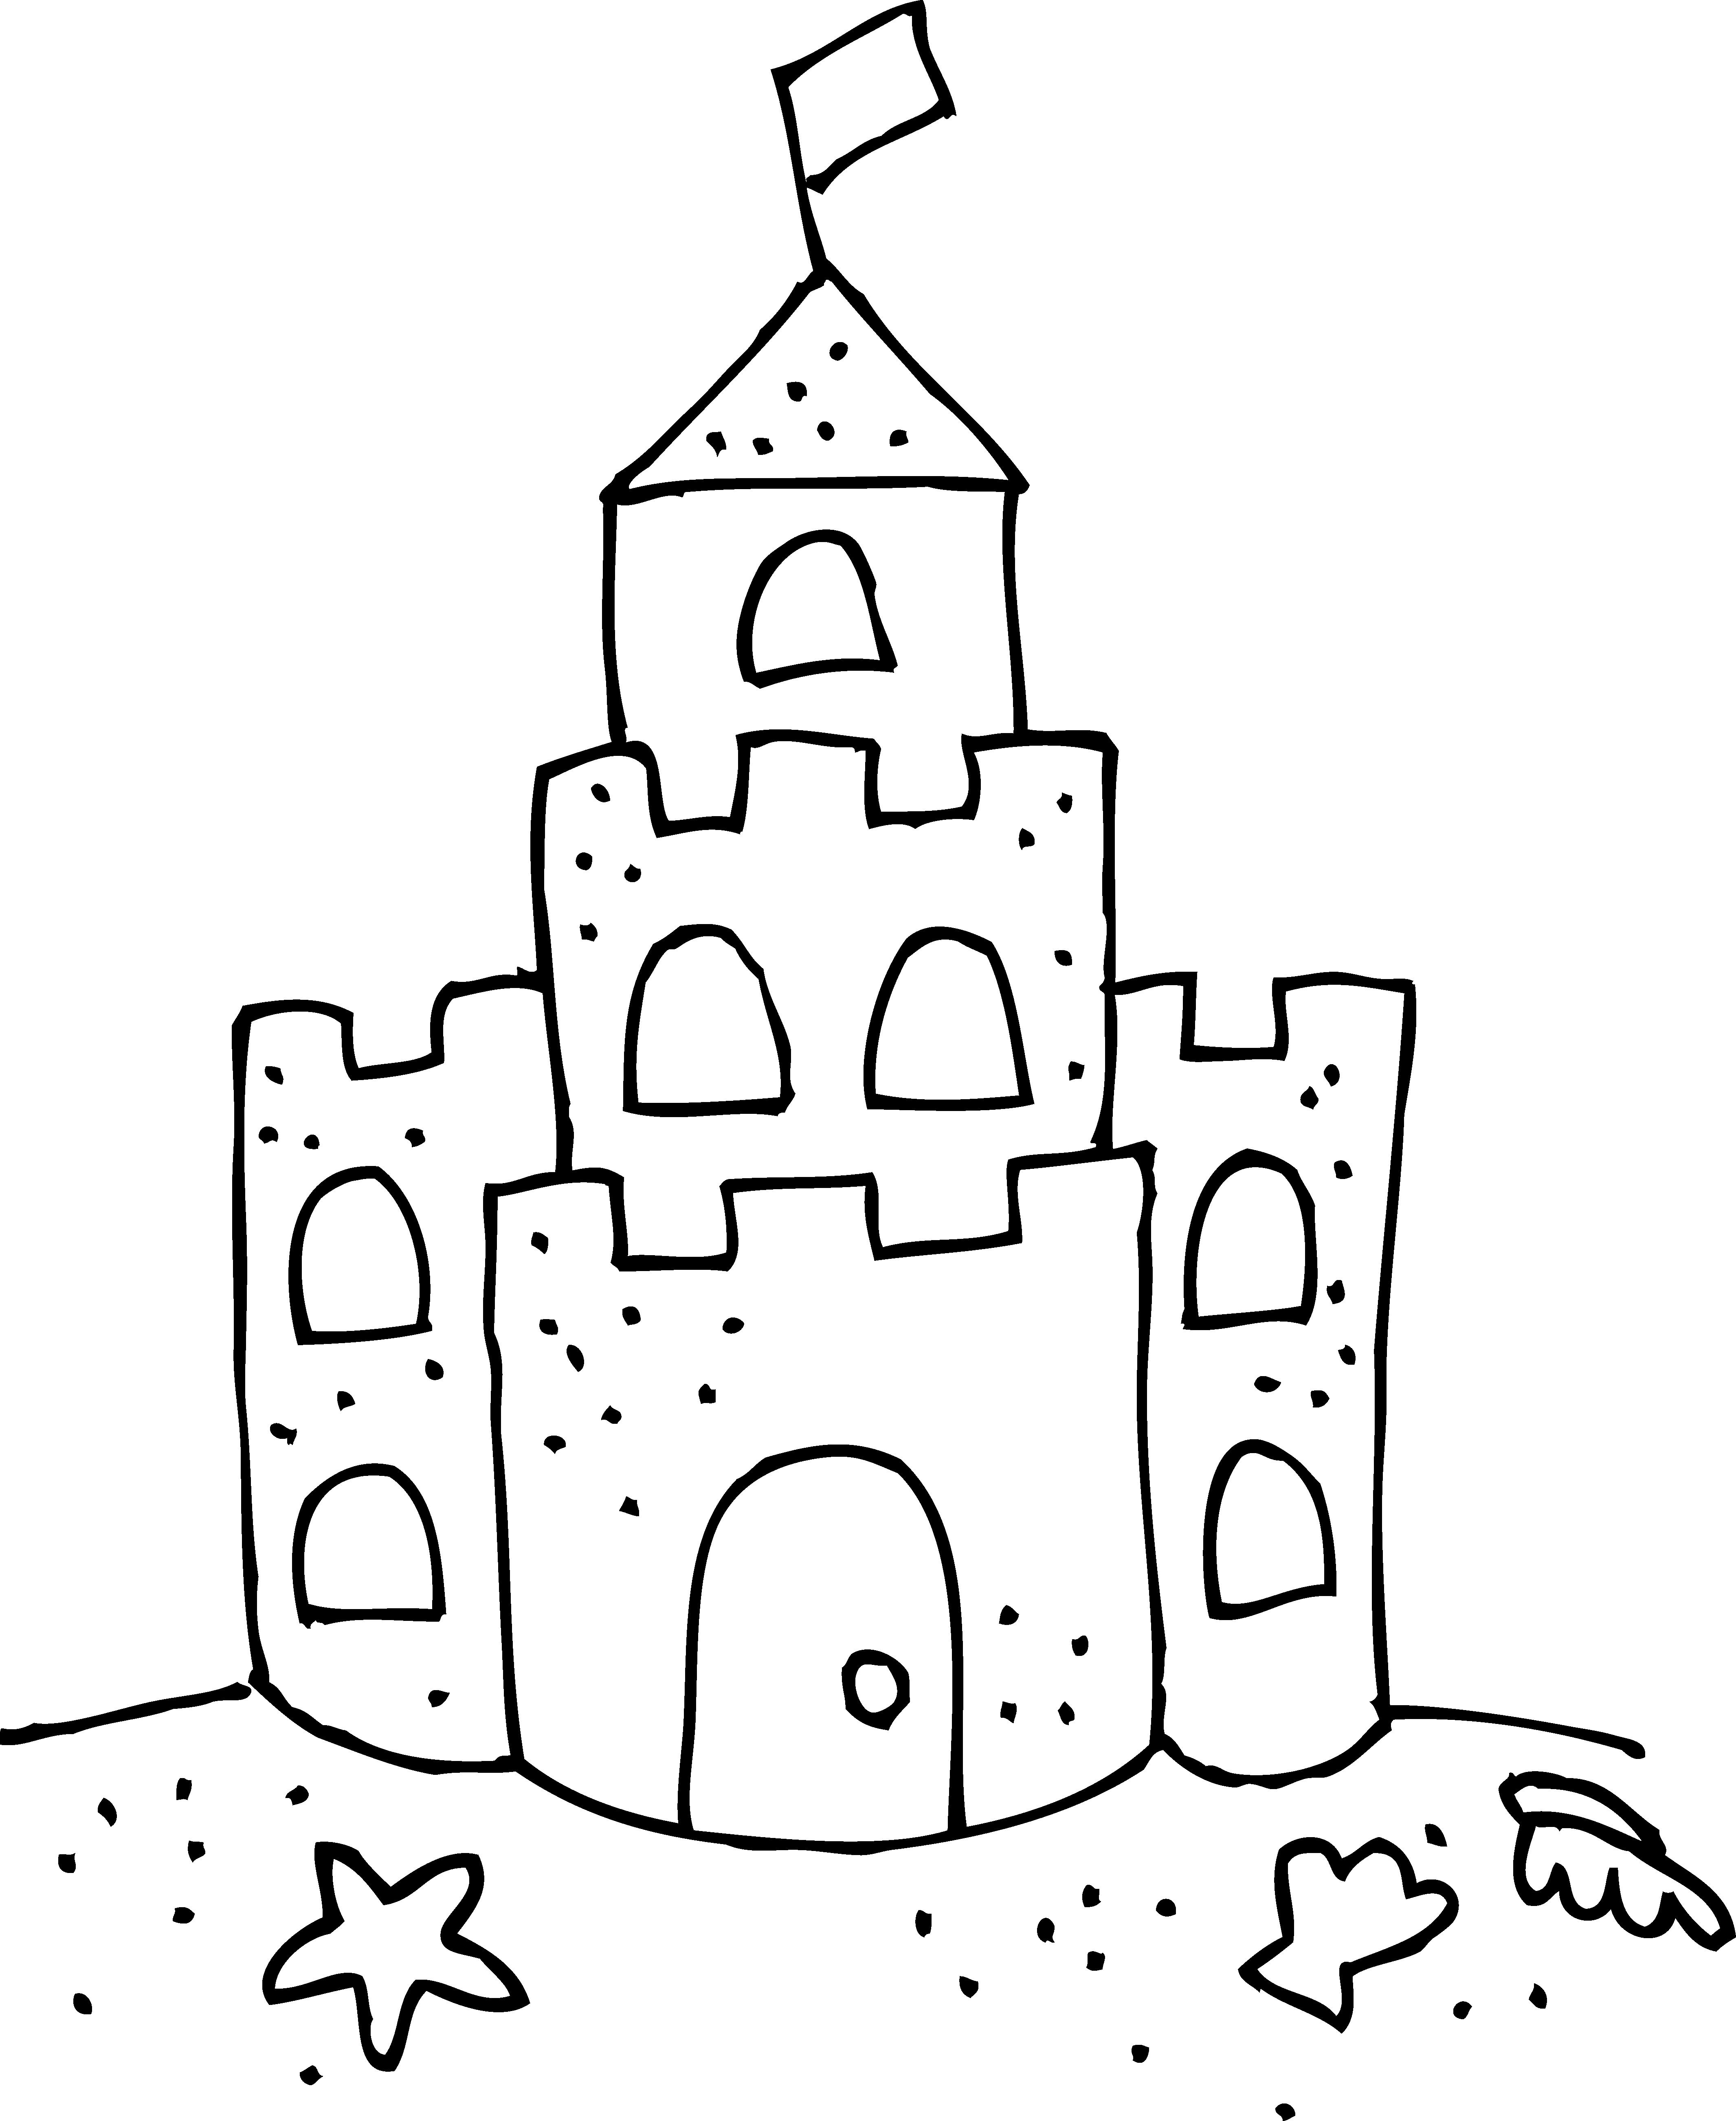 Sand Castle Clip Art Black And White Cute Sand Castle Coloring Page Castle Coloring Page Sand Art Crafts Sand Castle Craft